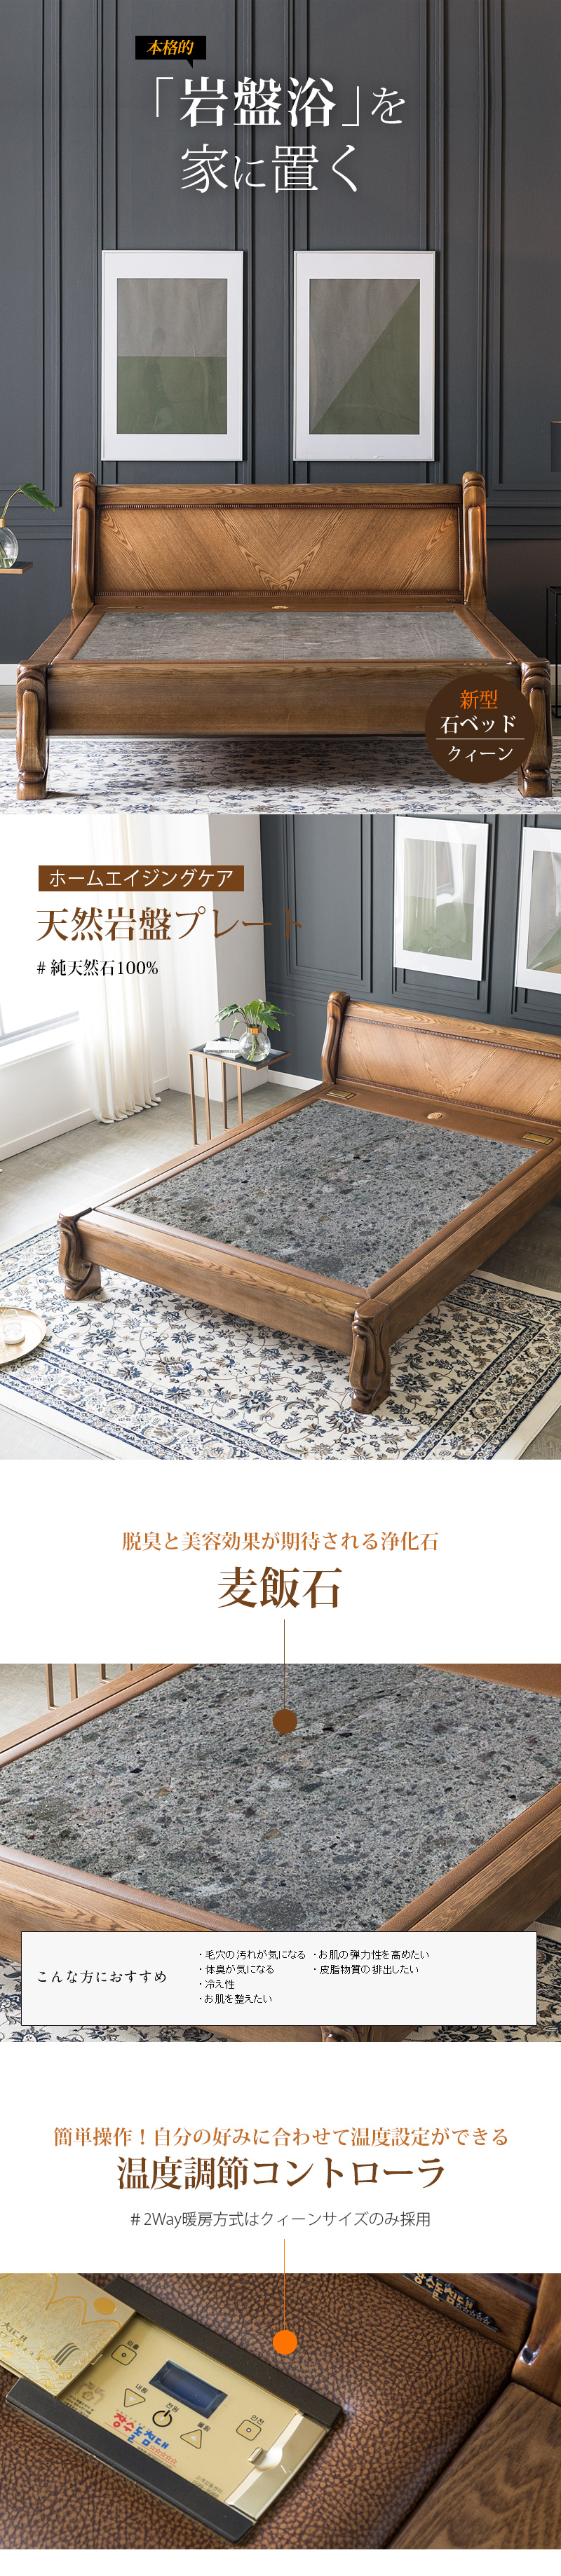 JANGSOO-遠赤外線 岩盤浴天然石ベッド / クィーン